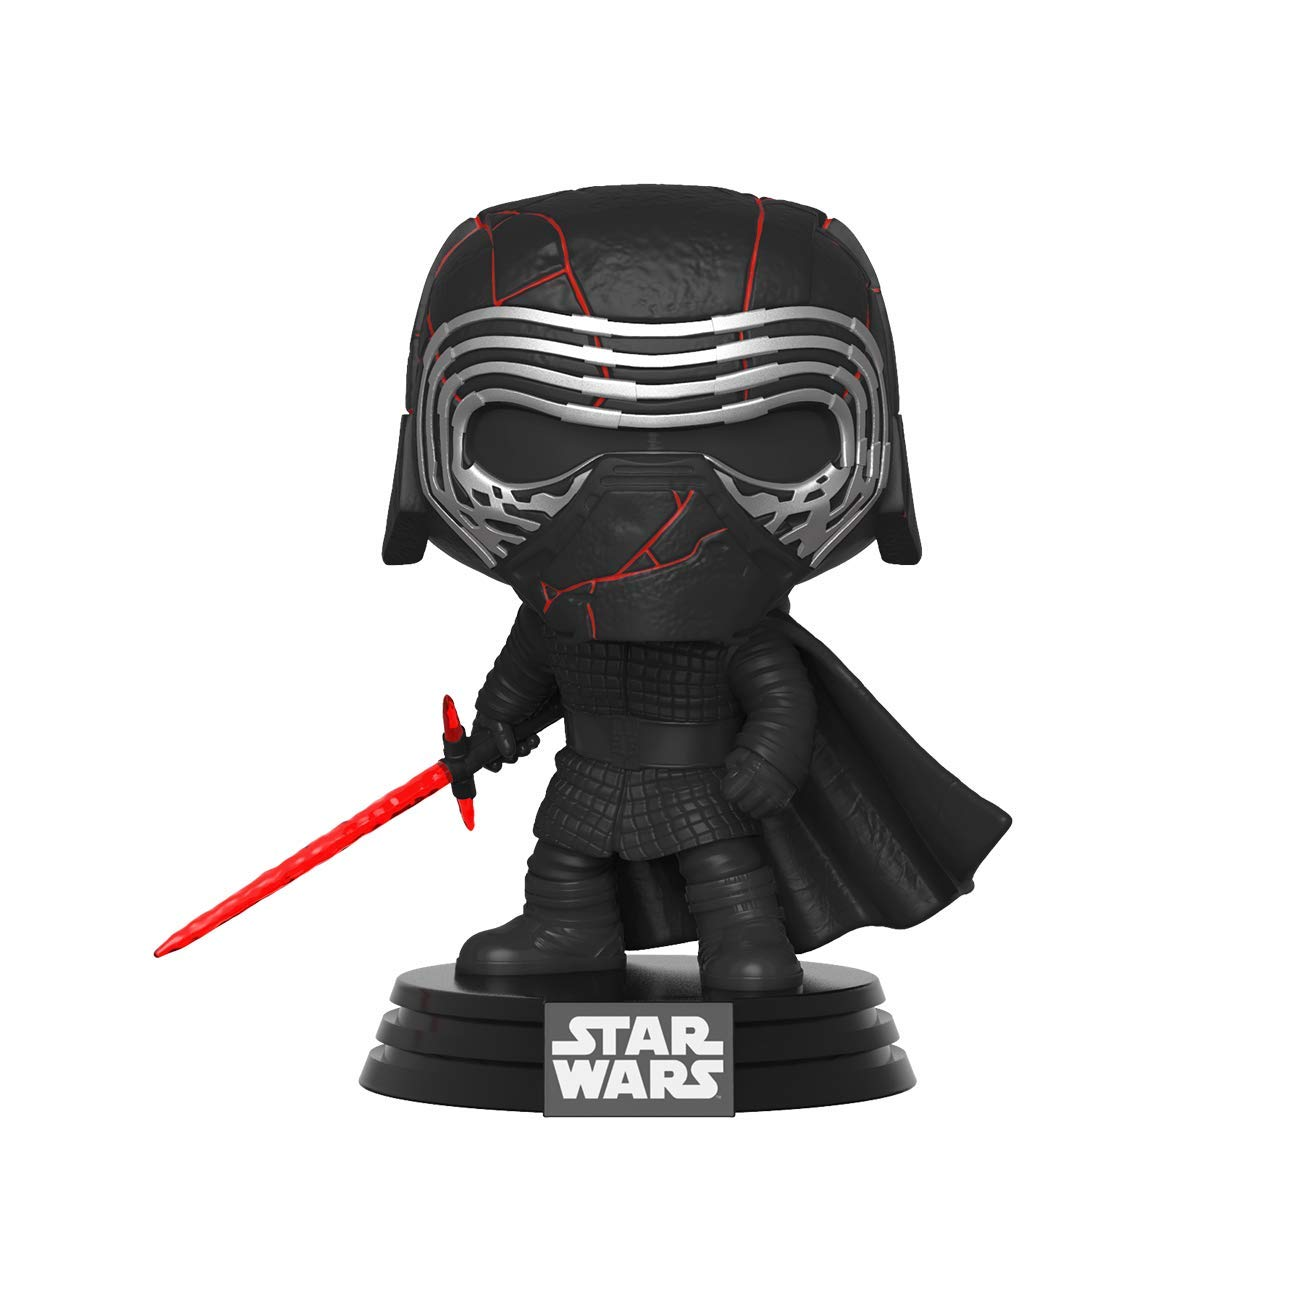 Funko Pop! Star Wars: Episode 9, Rise of Skywalker – Kylo Ren